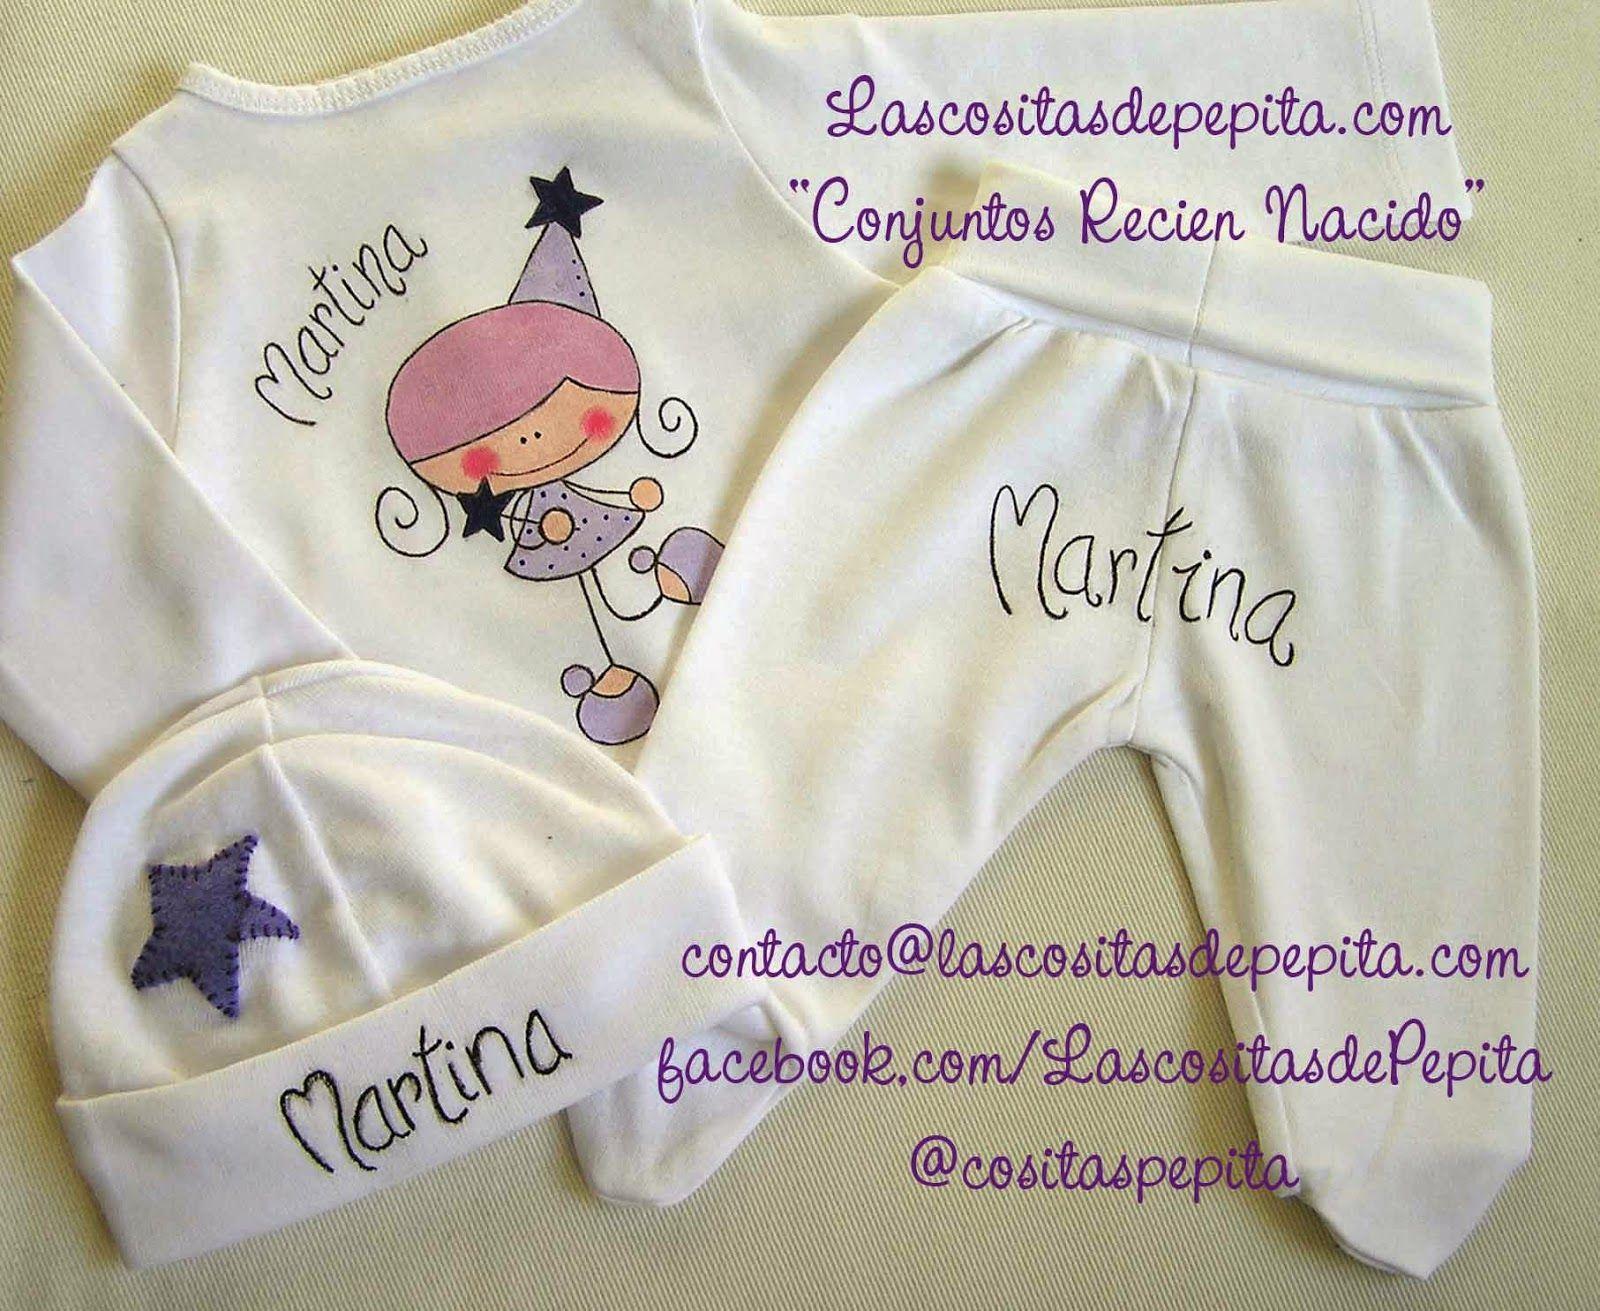 Las cositas de Pepita: Pijamas para bebes pintados a mano   Венок ...